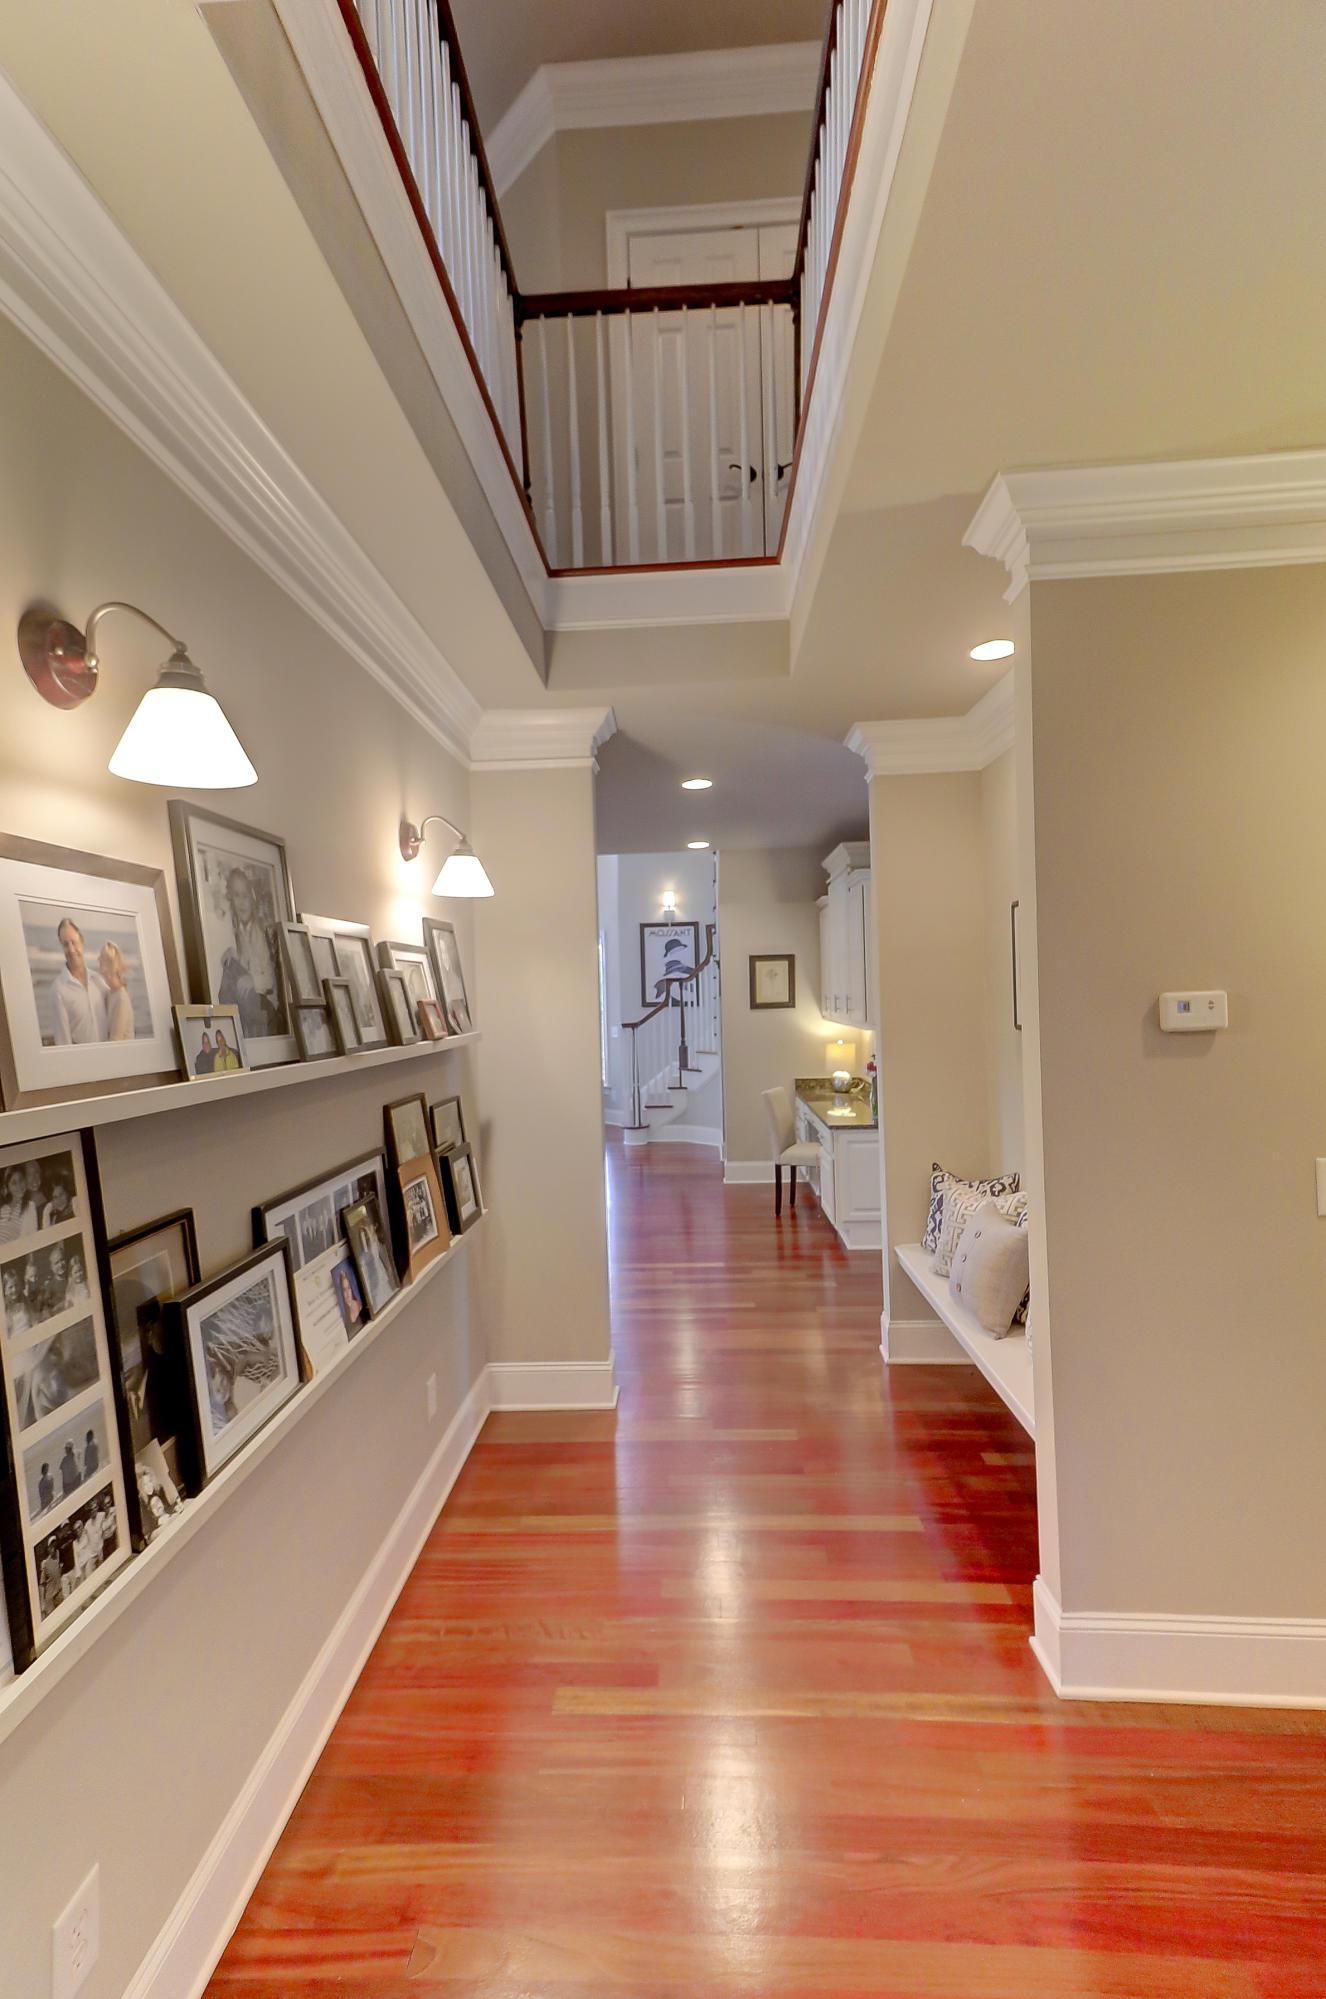 Dunes West Homes For Sale - 2996 Pignatelli Crescent, Mount Pleasant, SC - 79